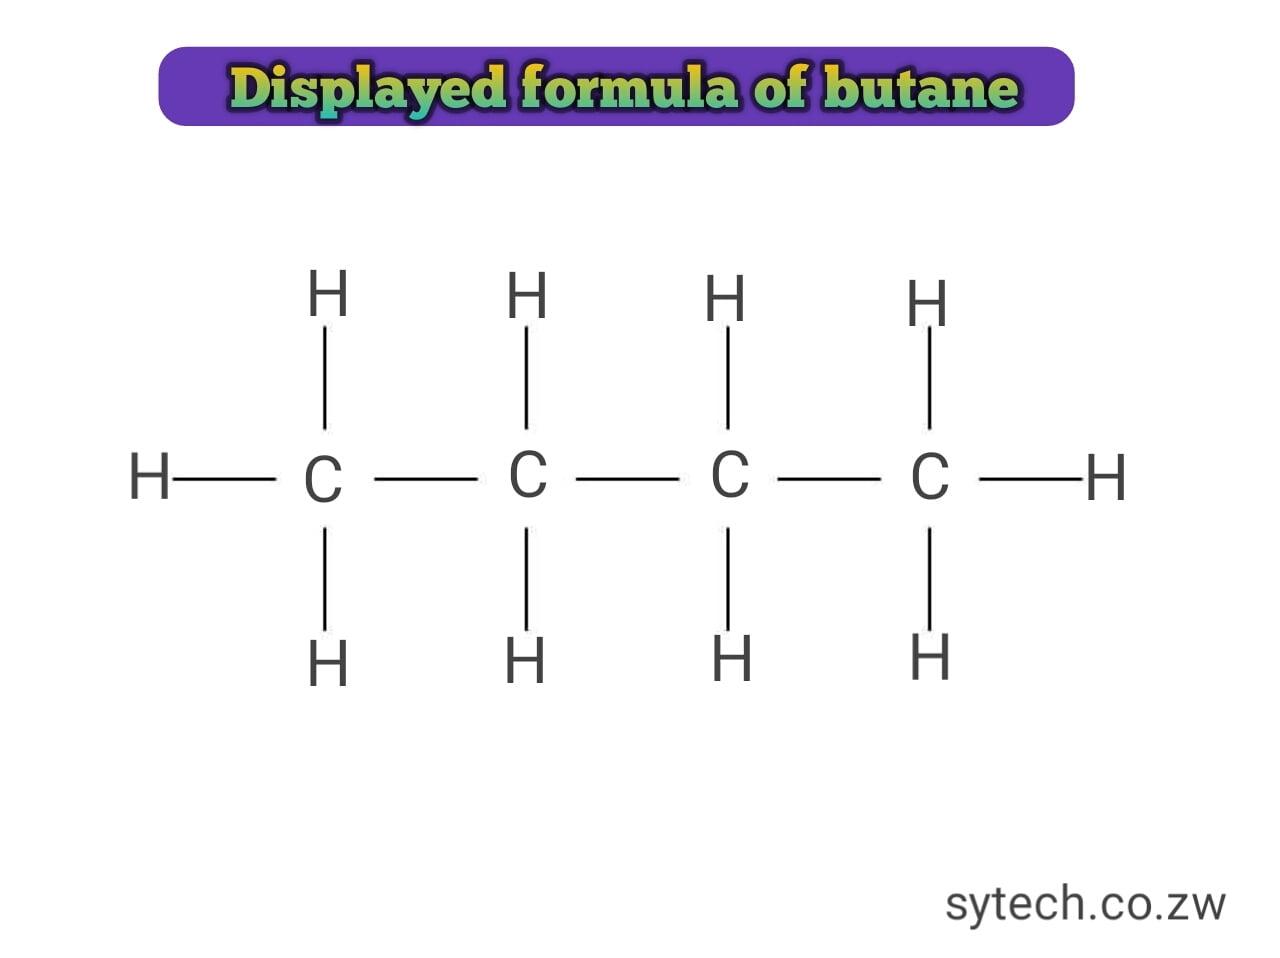 The homologous series of alkanes